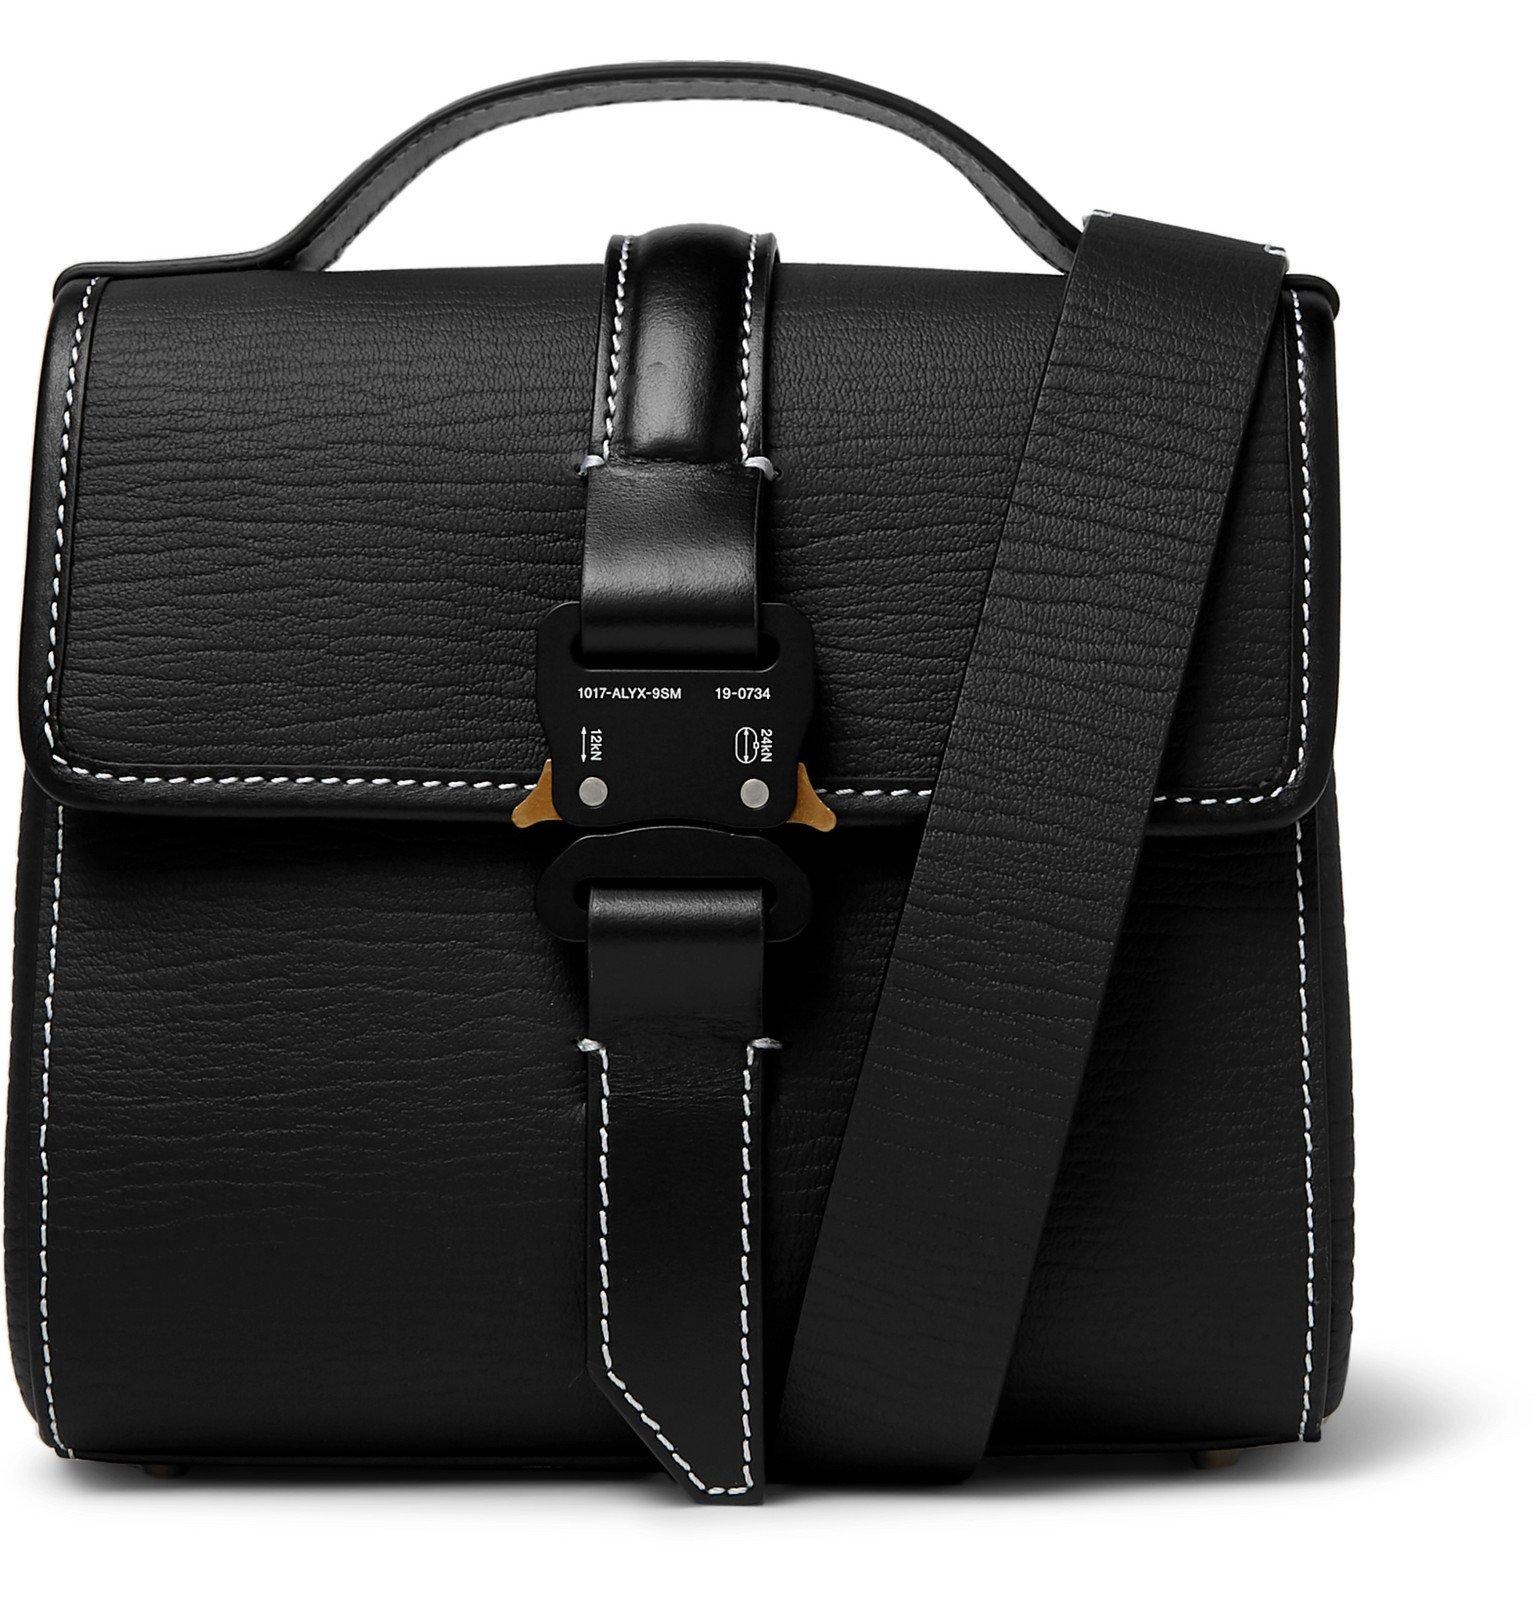 Photo: 1017 ALYX 9SM - Anna Textured-Leather Messenger Bag - Black